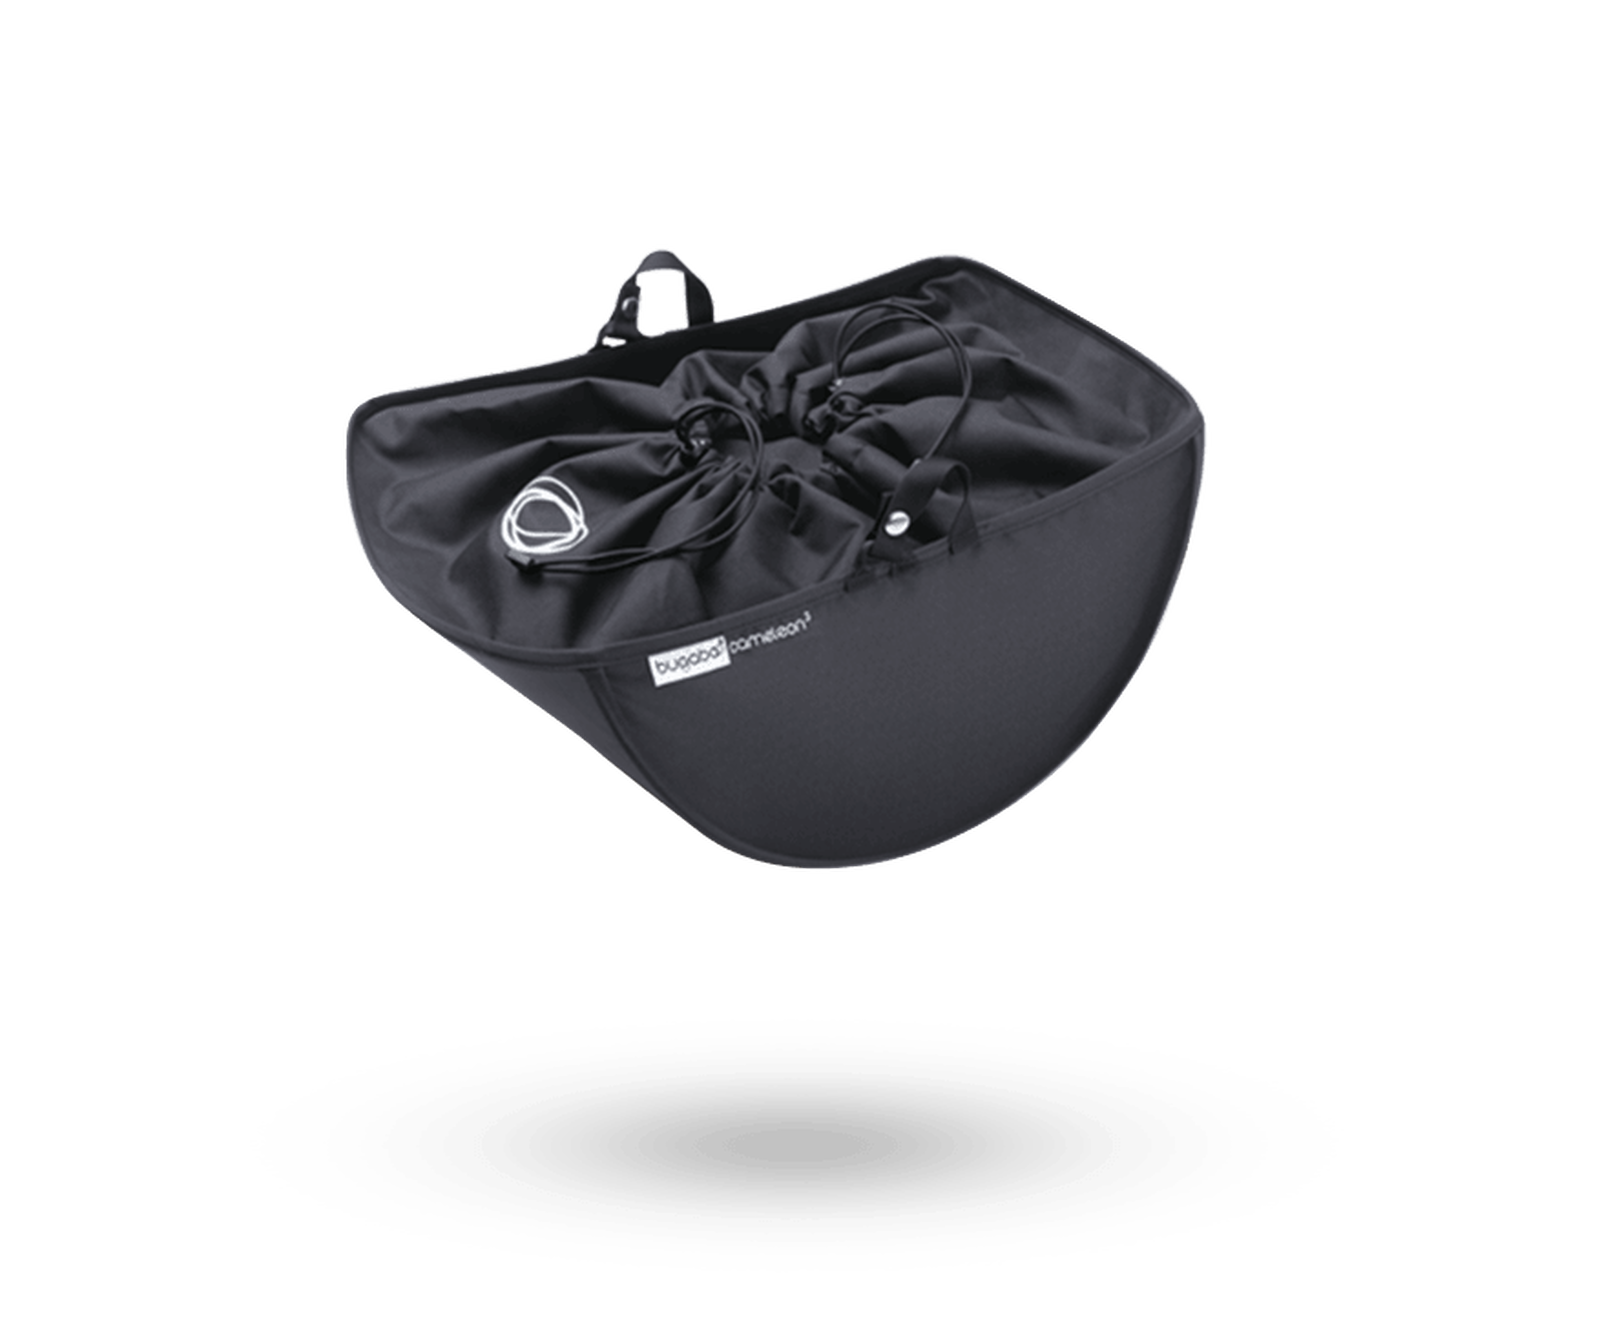 Bugaboo Cameleon underseat bag